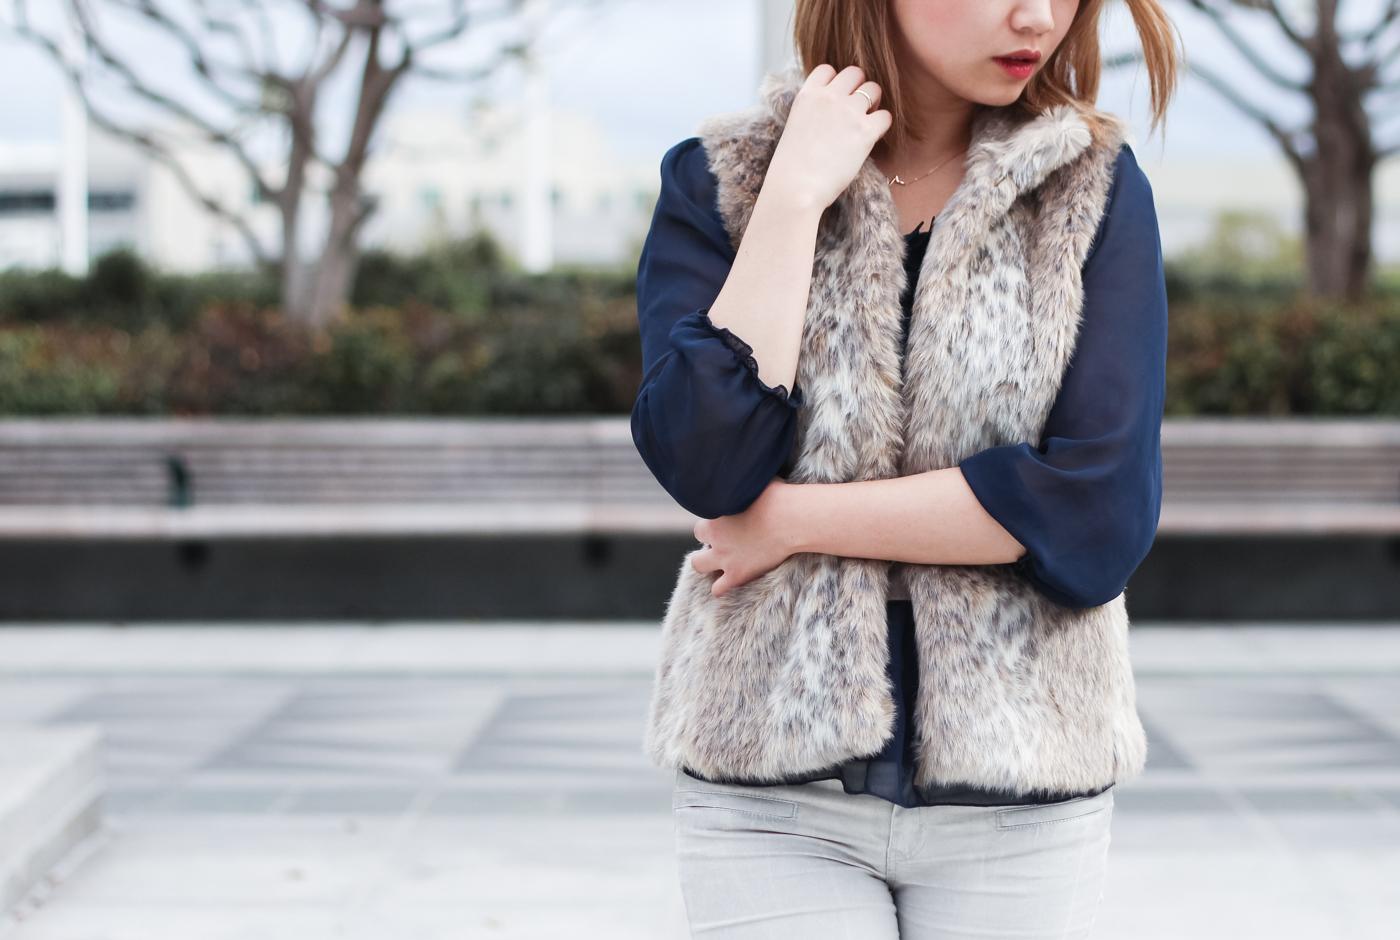 Banana Republic Faux Fur Vest | The Chic Diary